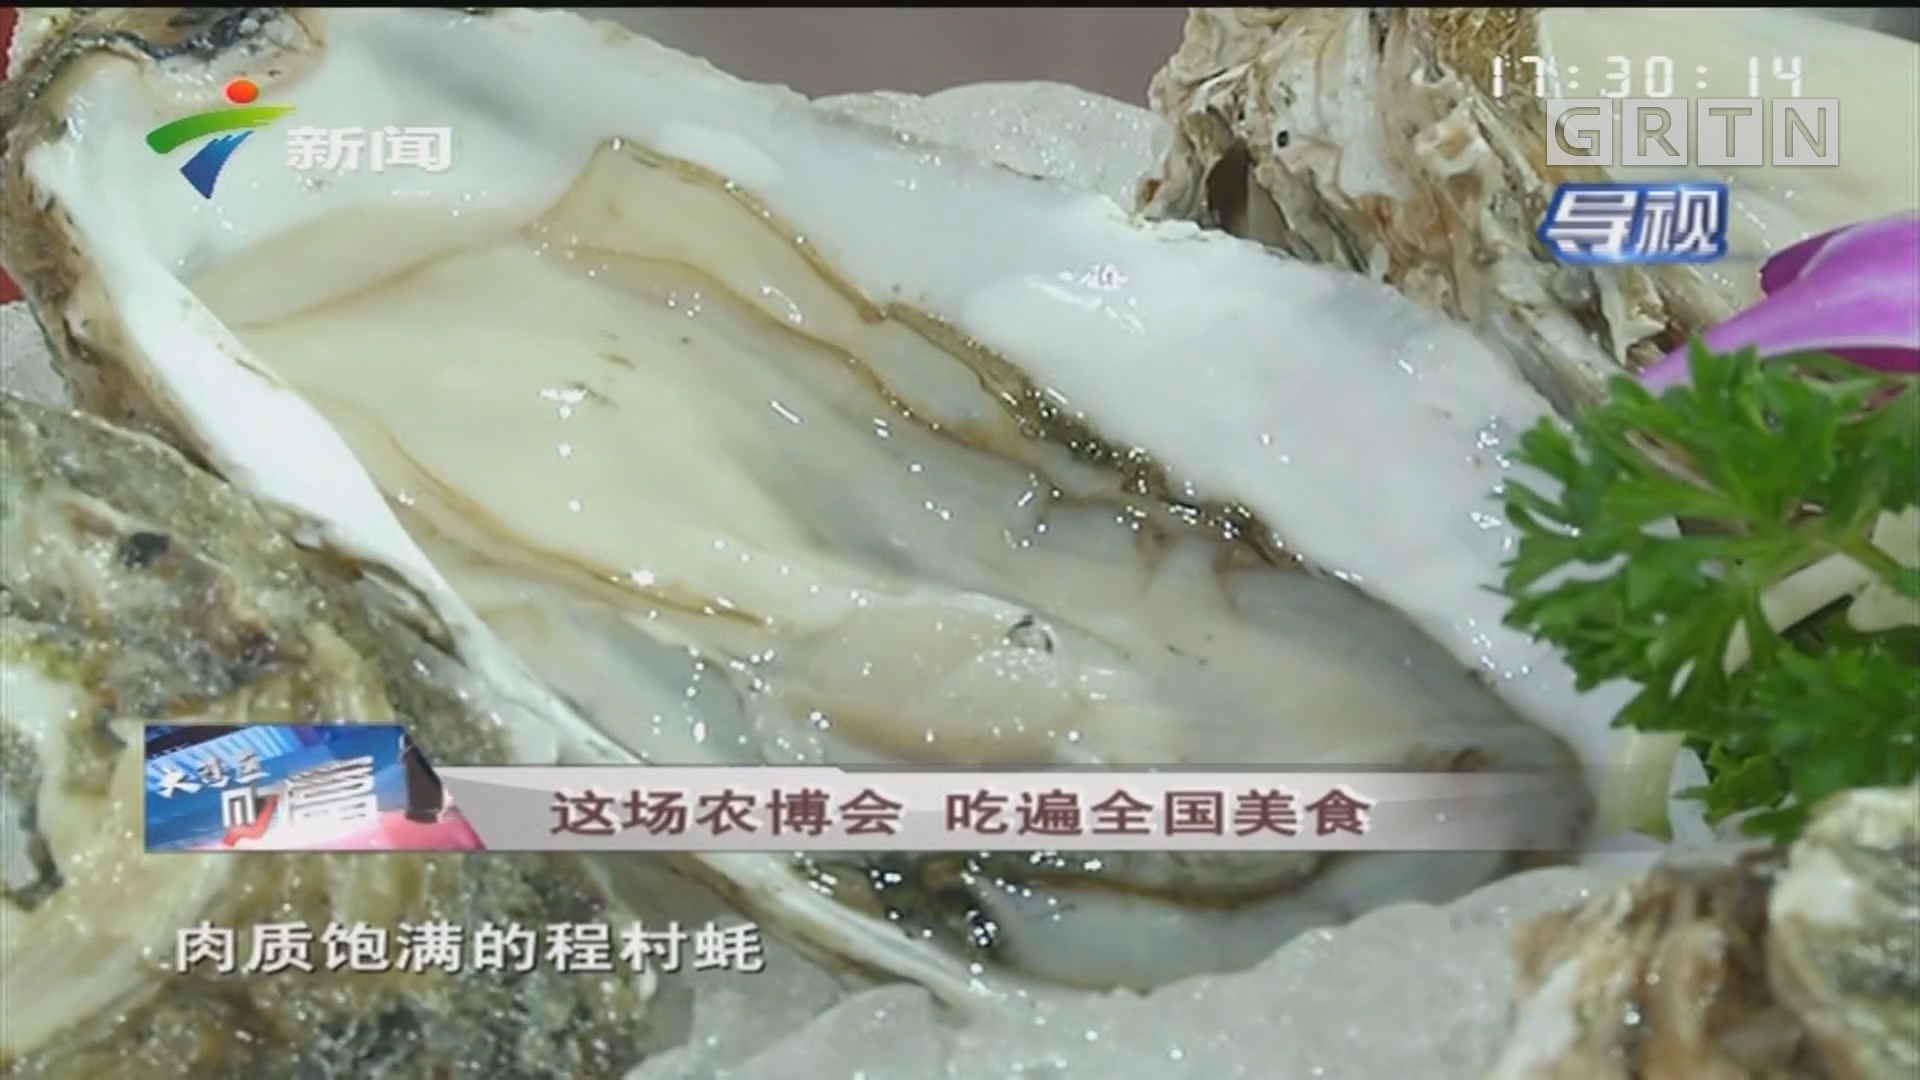 [HD][2019-12-07]大湾区财富通:这场农博会 吃遍全国美食